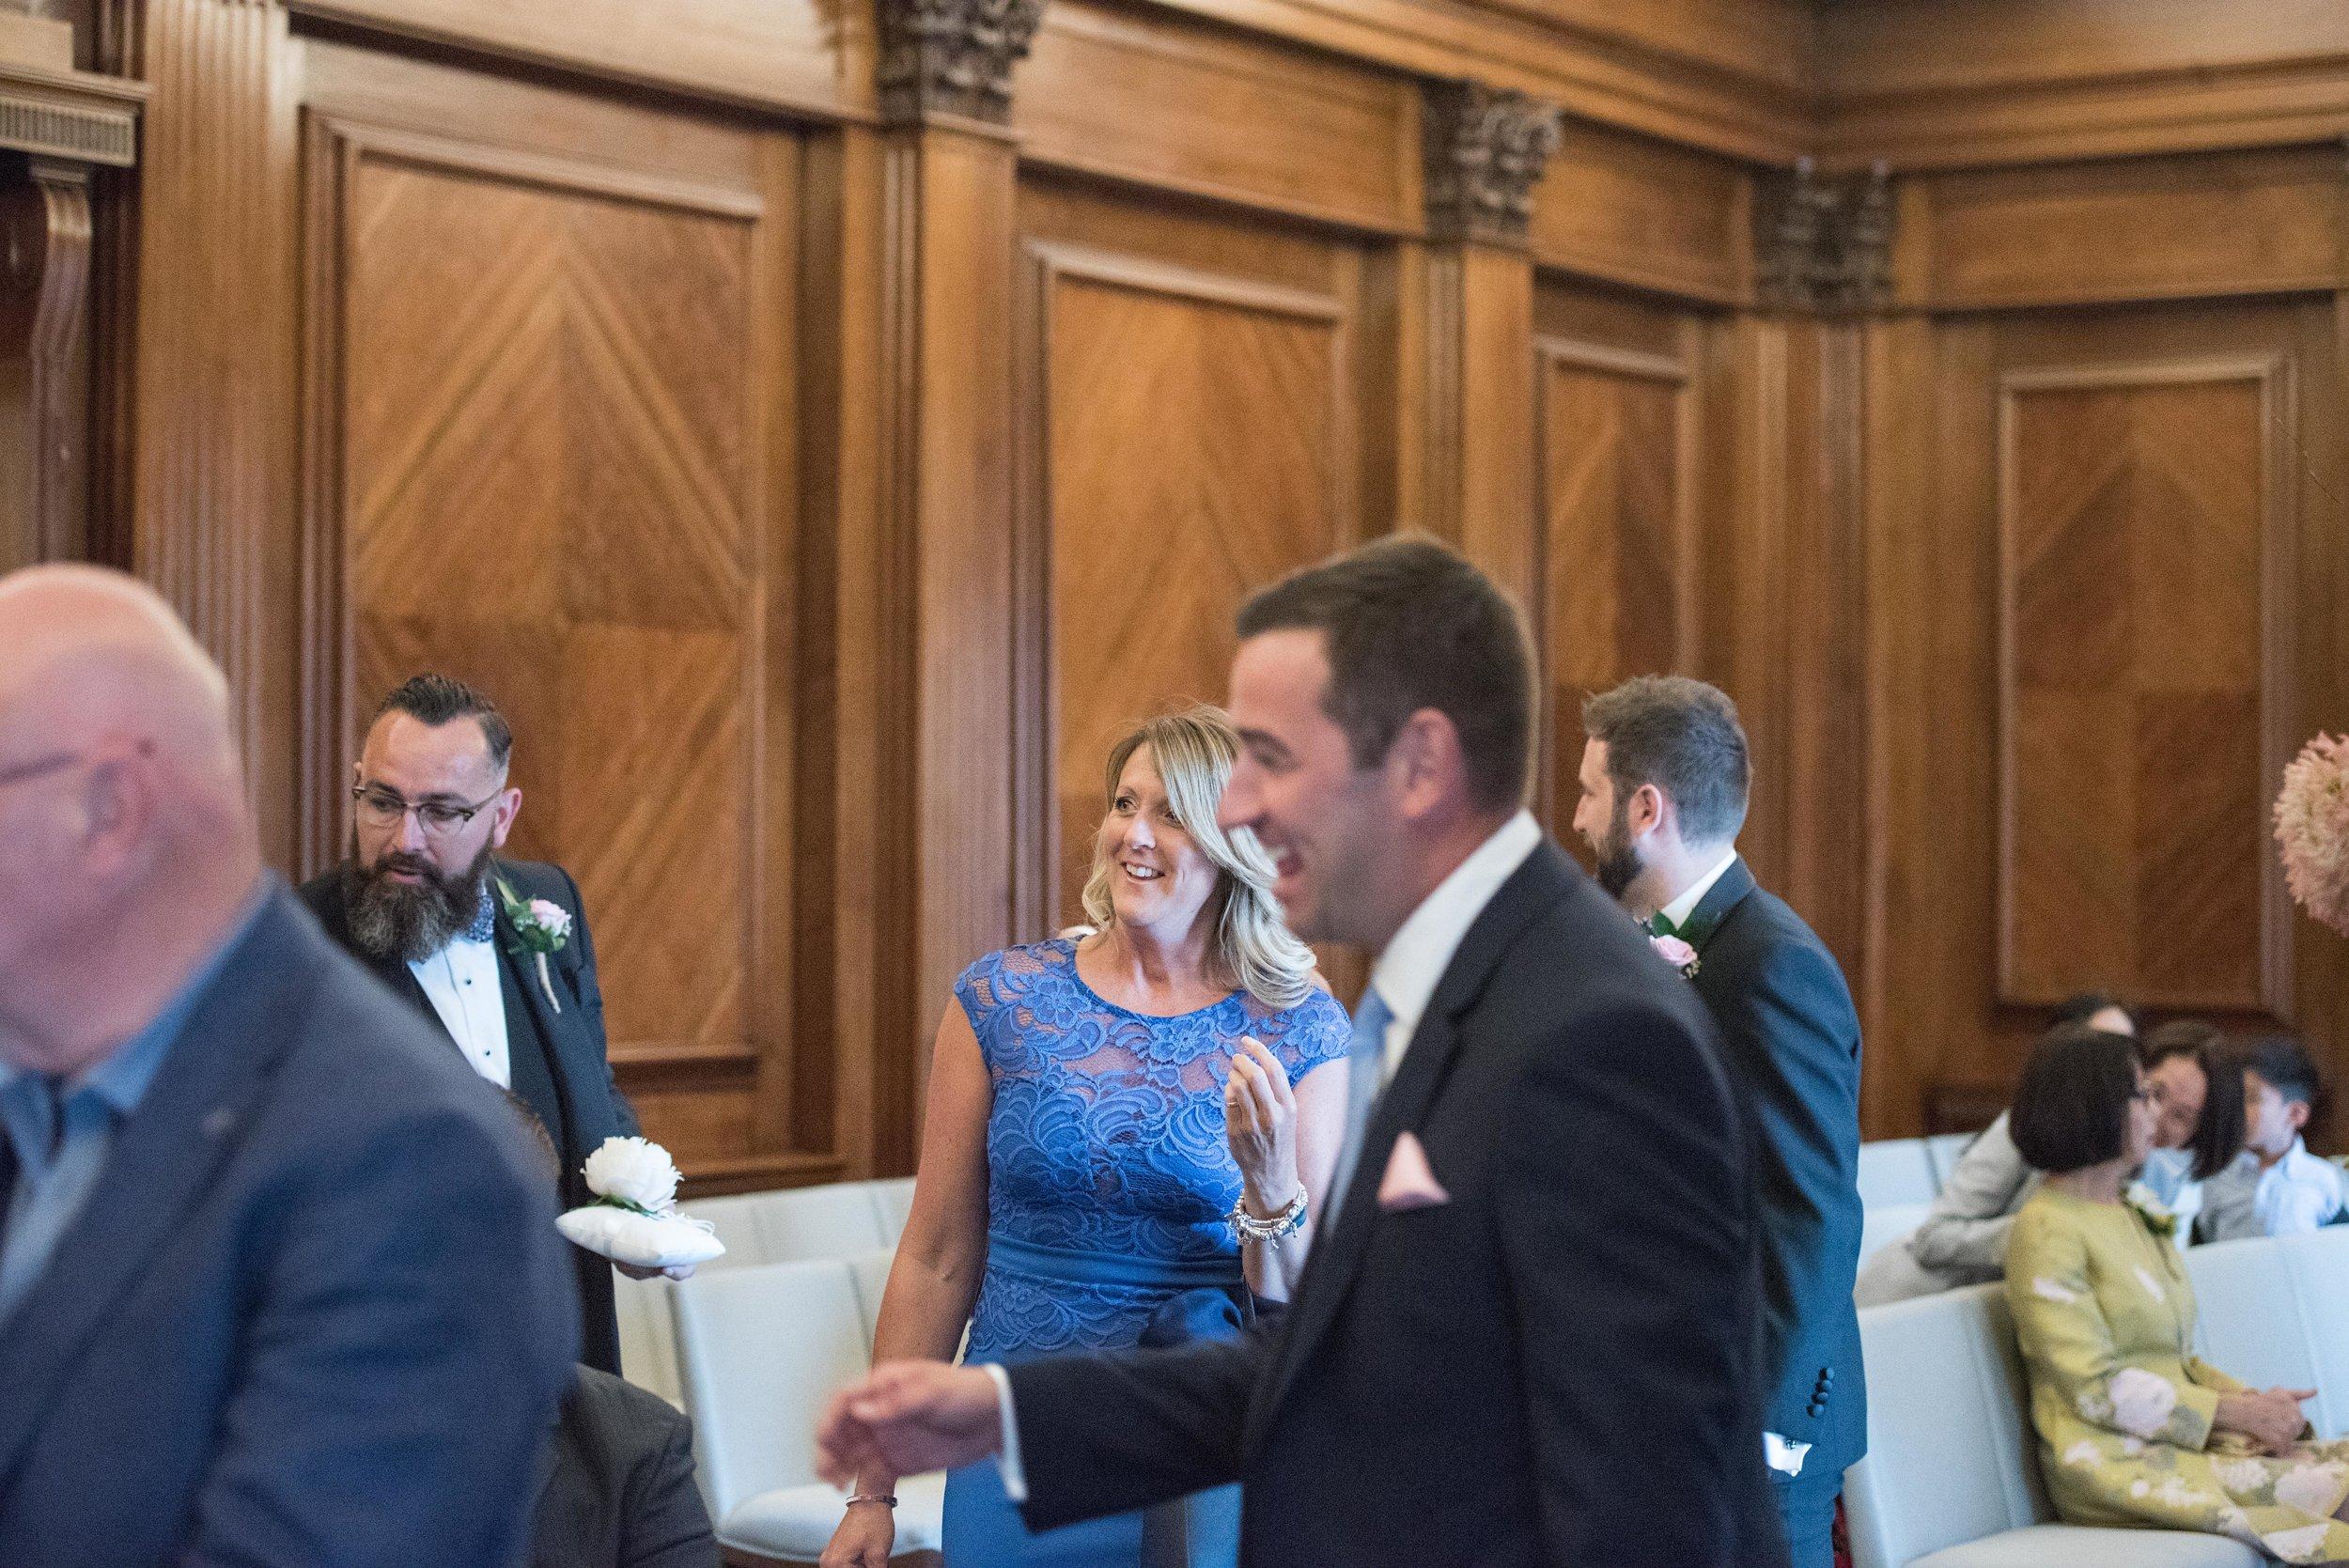 D&M_Marylebone Town Hall Wedding (67 of 239).jpg